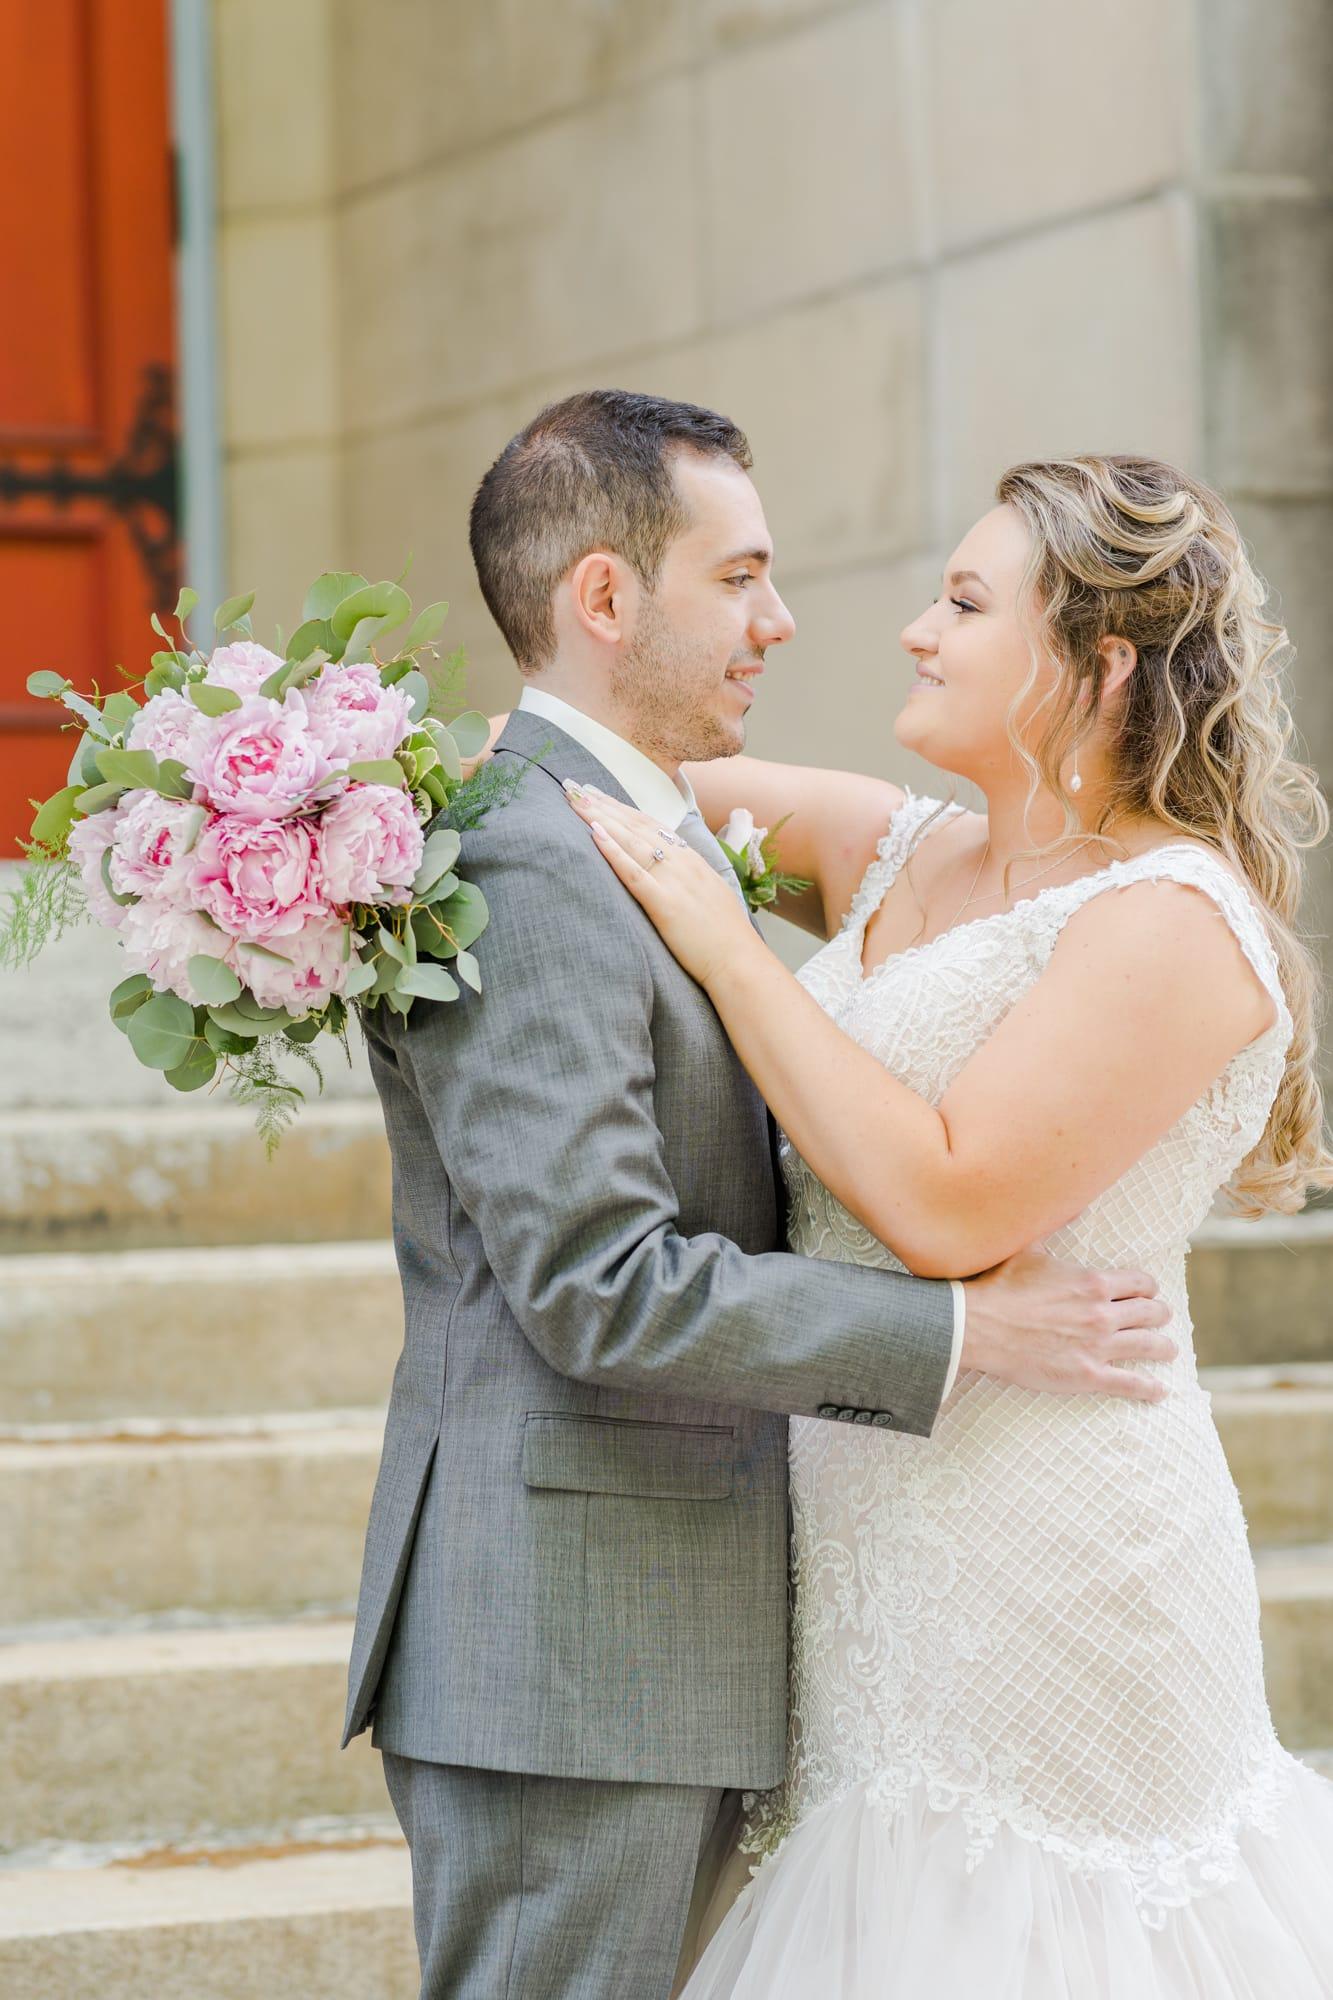 Central Pennsylvania PA summer wedding bride and groom portrait